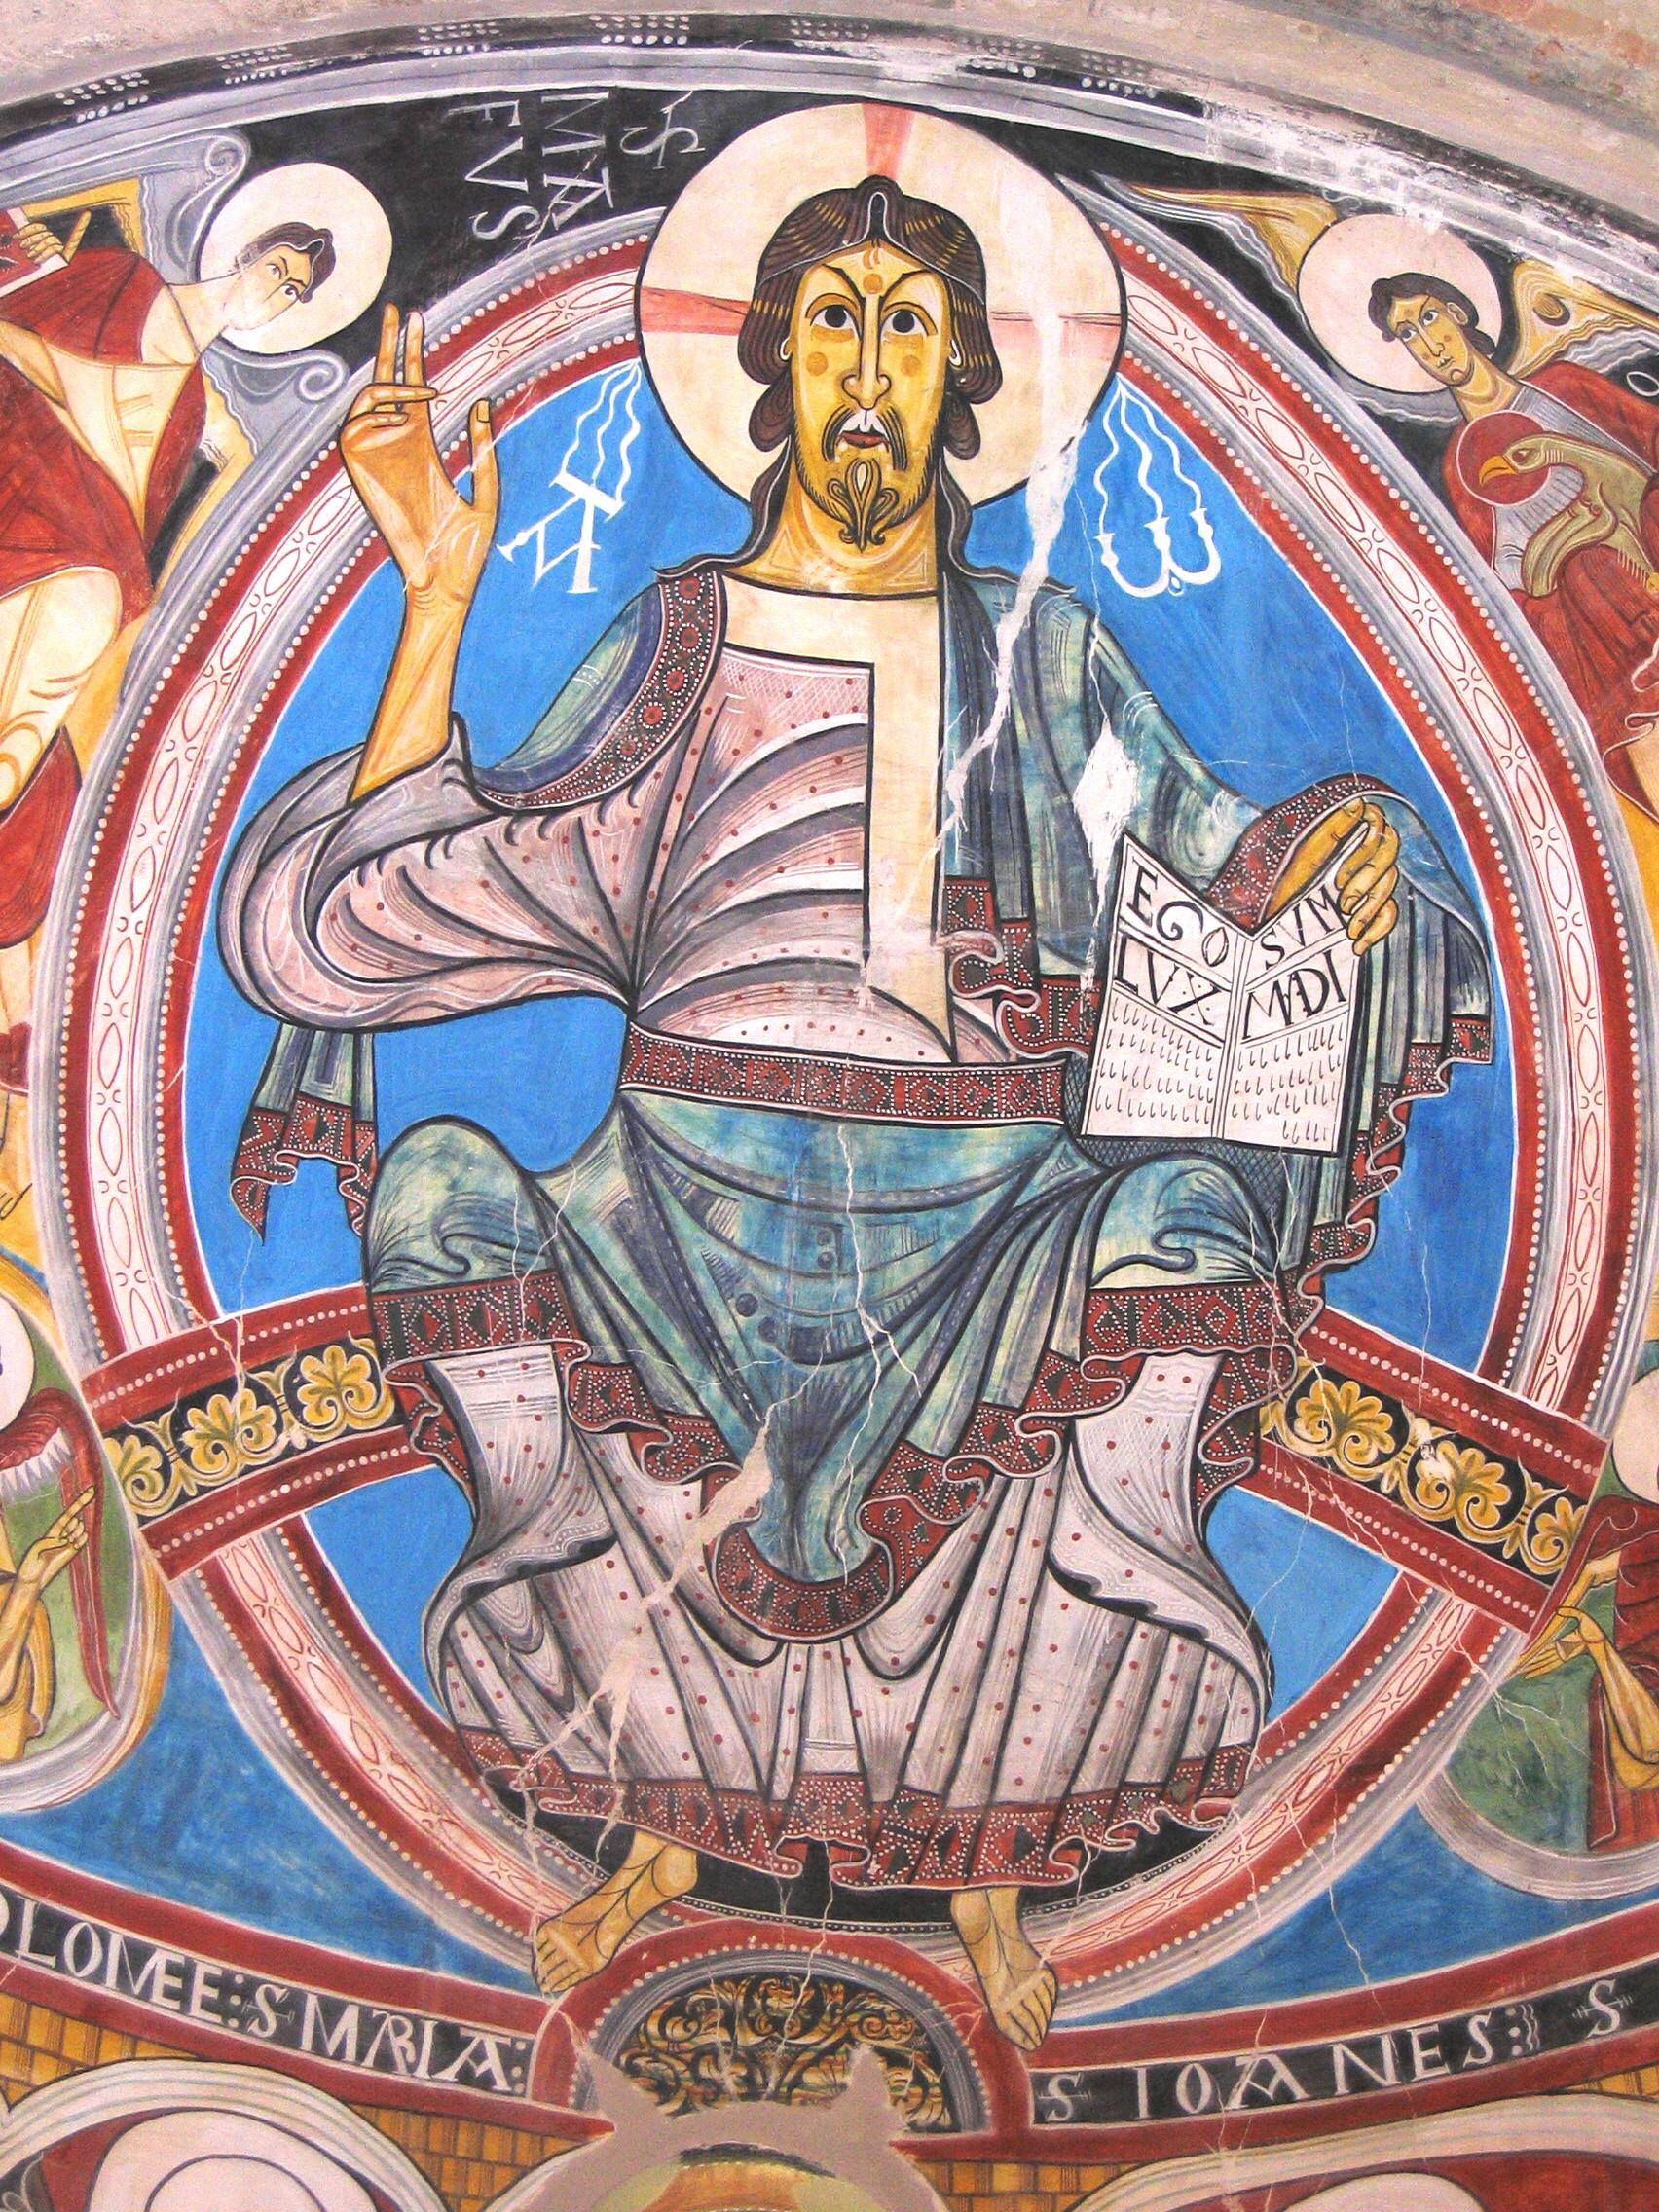 Christ en majeste de Taull 1123 musee national d'Art de Catalogne, Barcelone